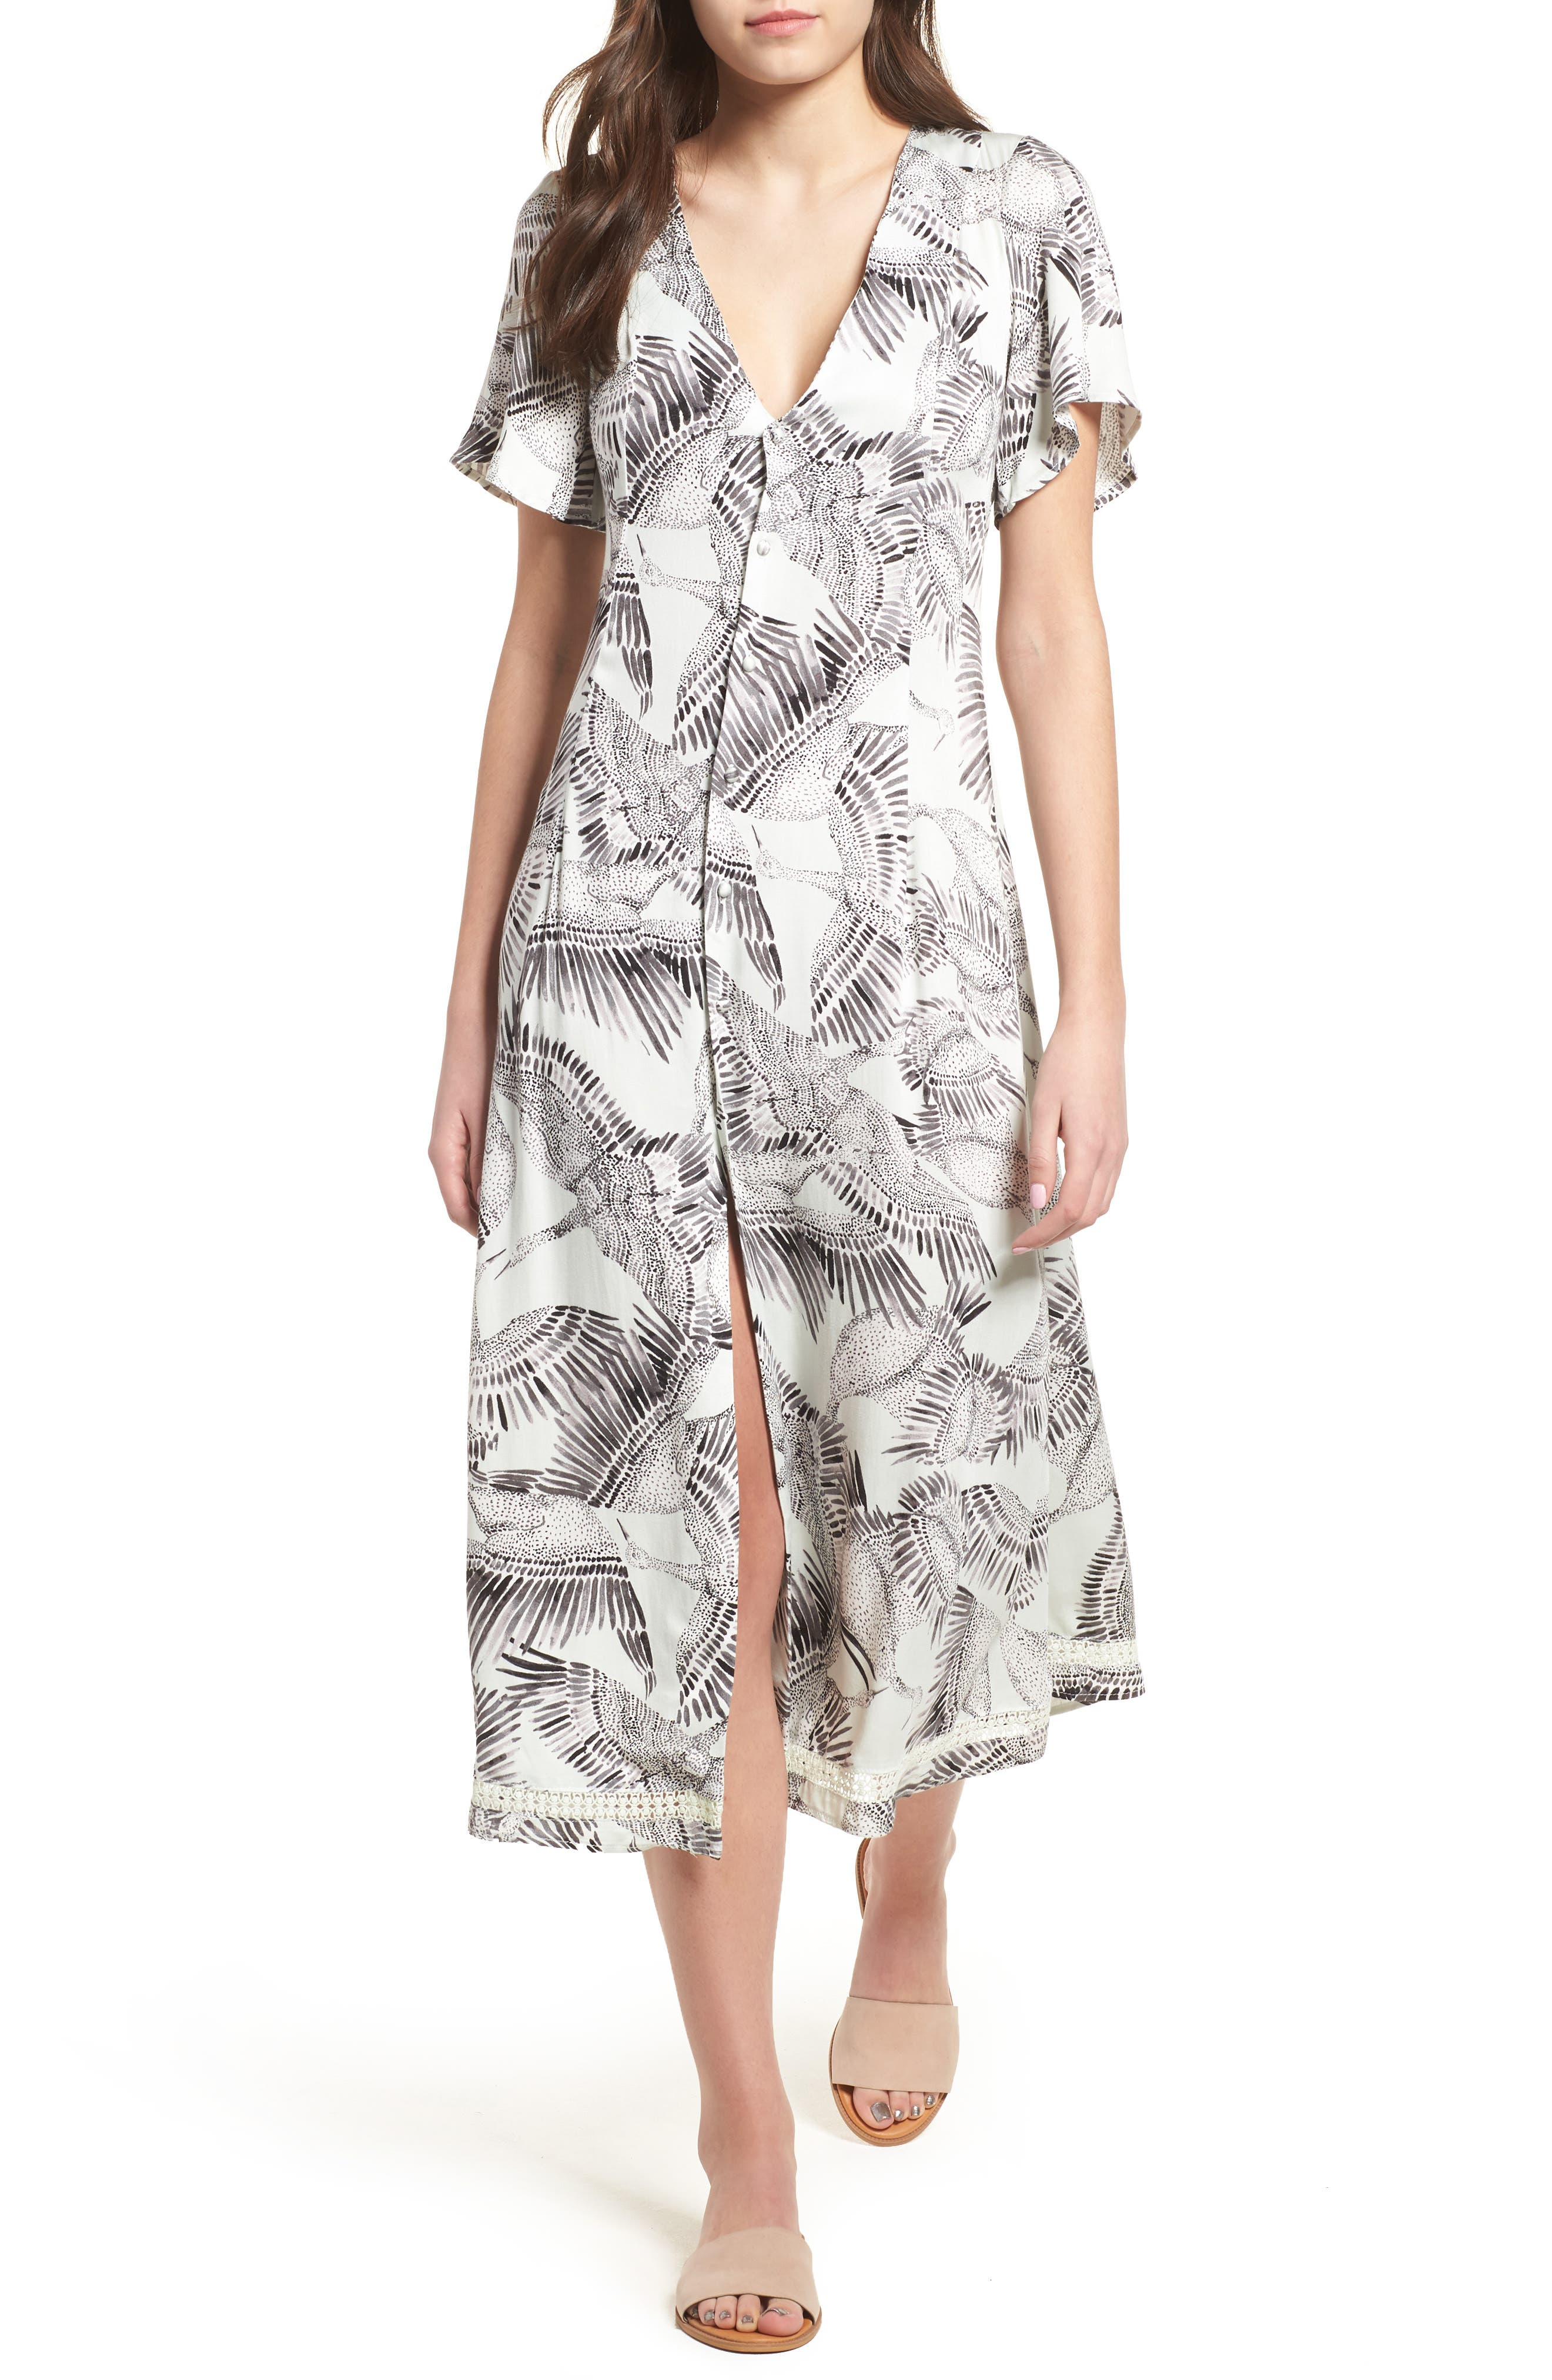 Taking Flight Midi Dress,                         Main,                         color, Multi Grey